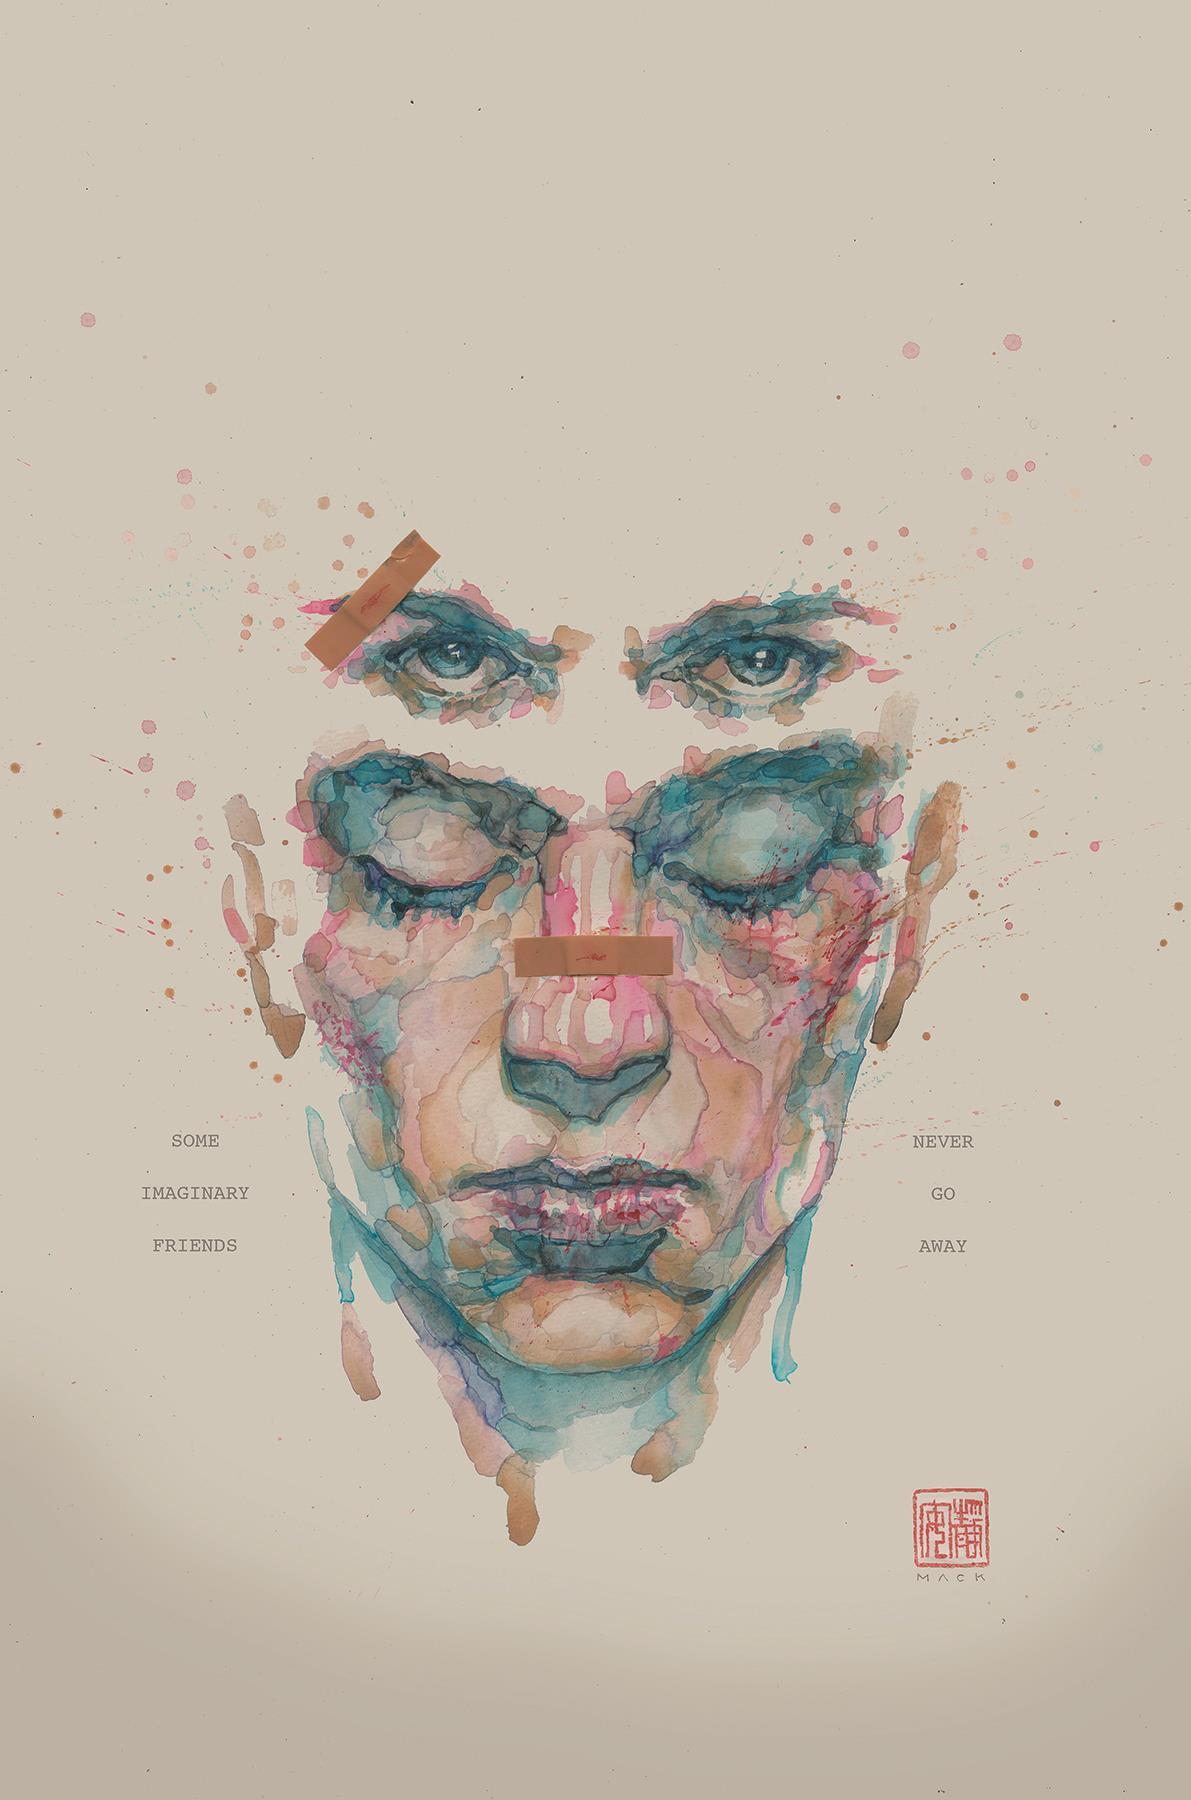 La copertinad i Fight Club 2 disegnata da David Mack